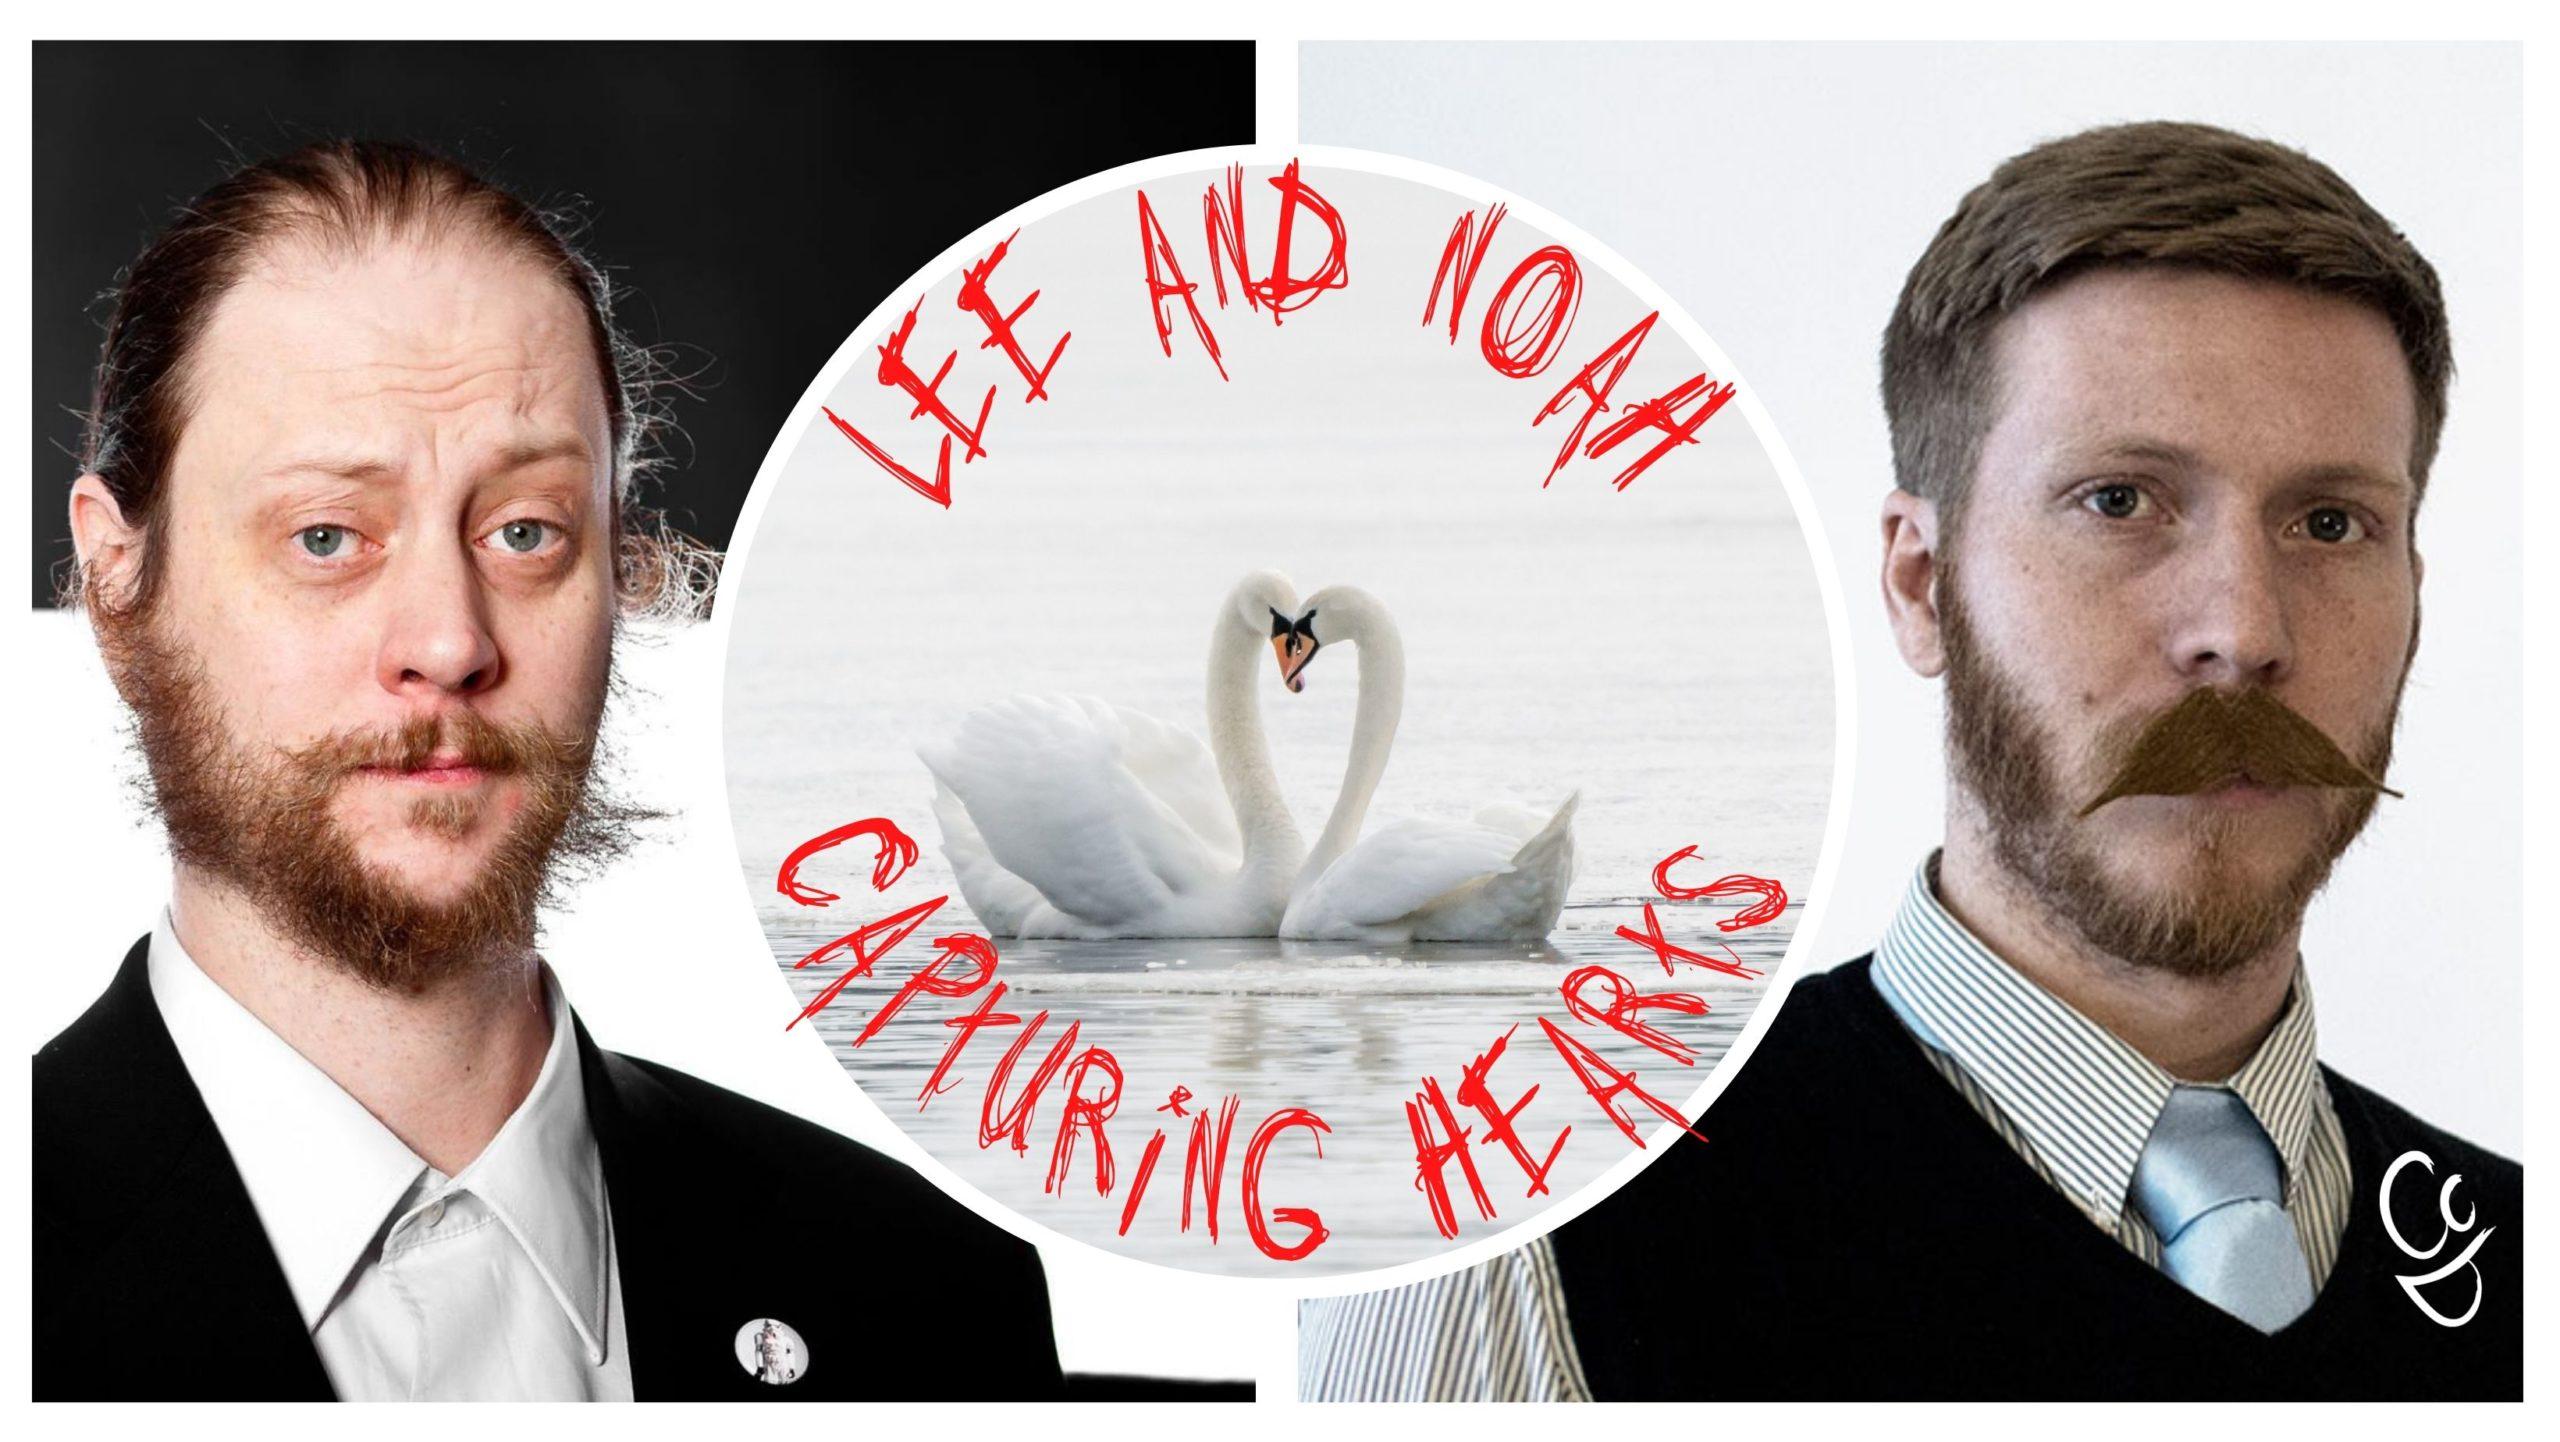 Lee and Noah capturing hearts